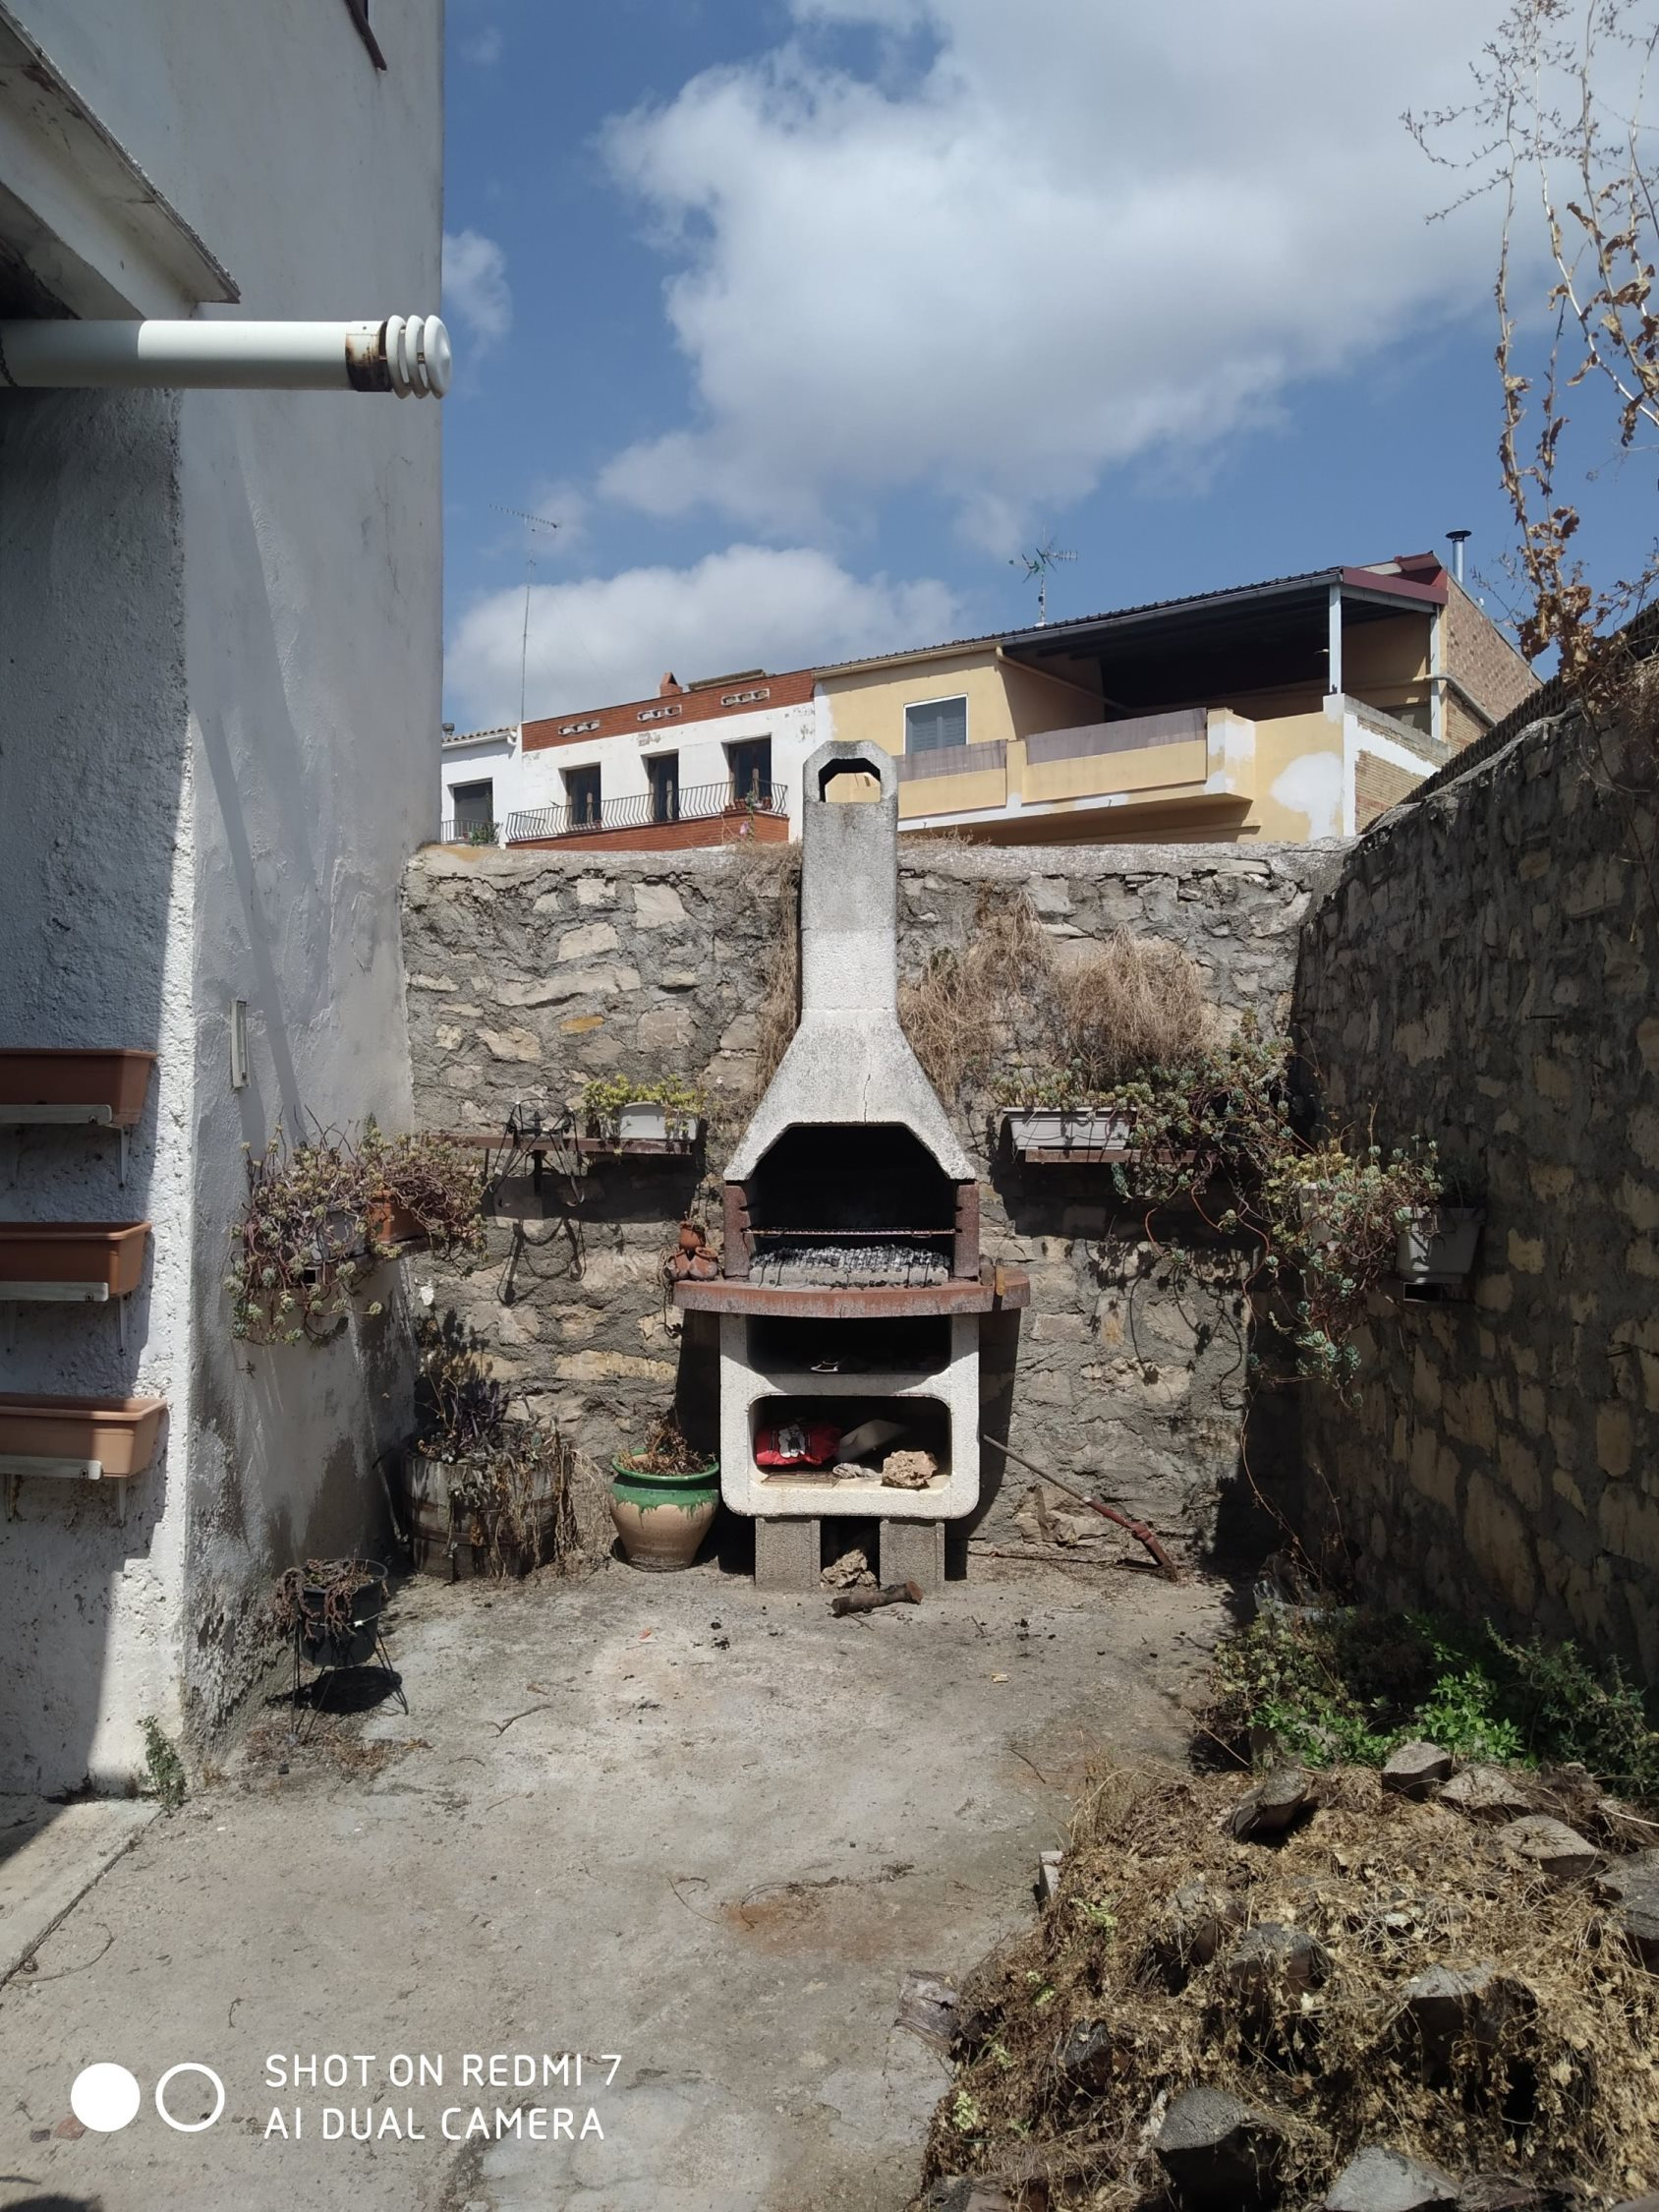 CORBERA D'EBRE, 5 Bedrooms Bedrooms, 2 Rooms Rooms,1 BathroomBathrooms,Casa de Poble,Urbana,CORBERA D'EBRE,1253